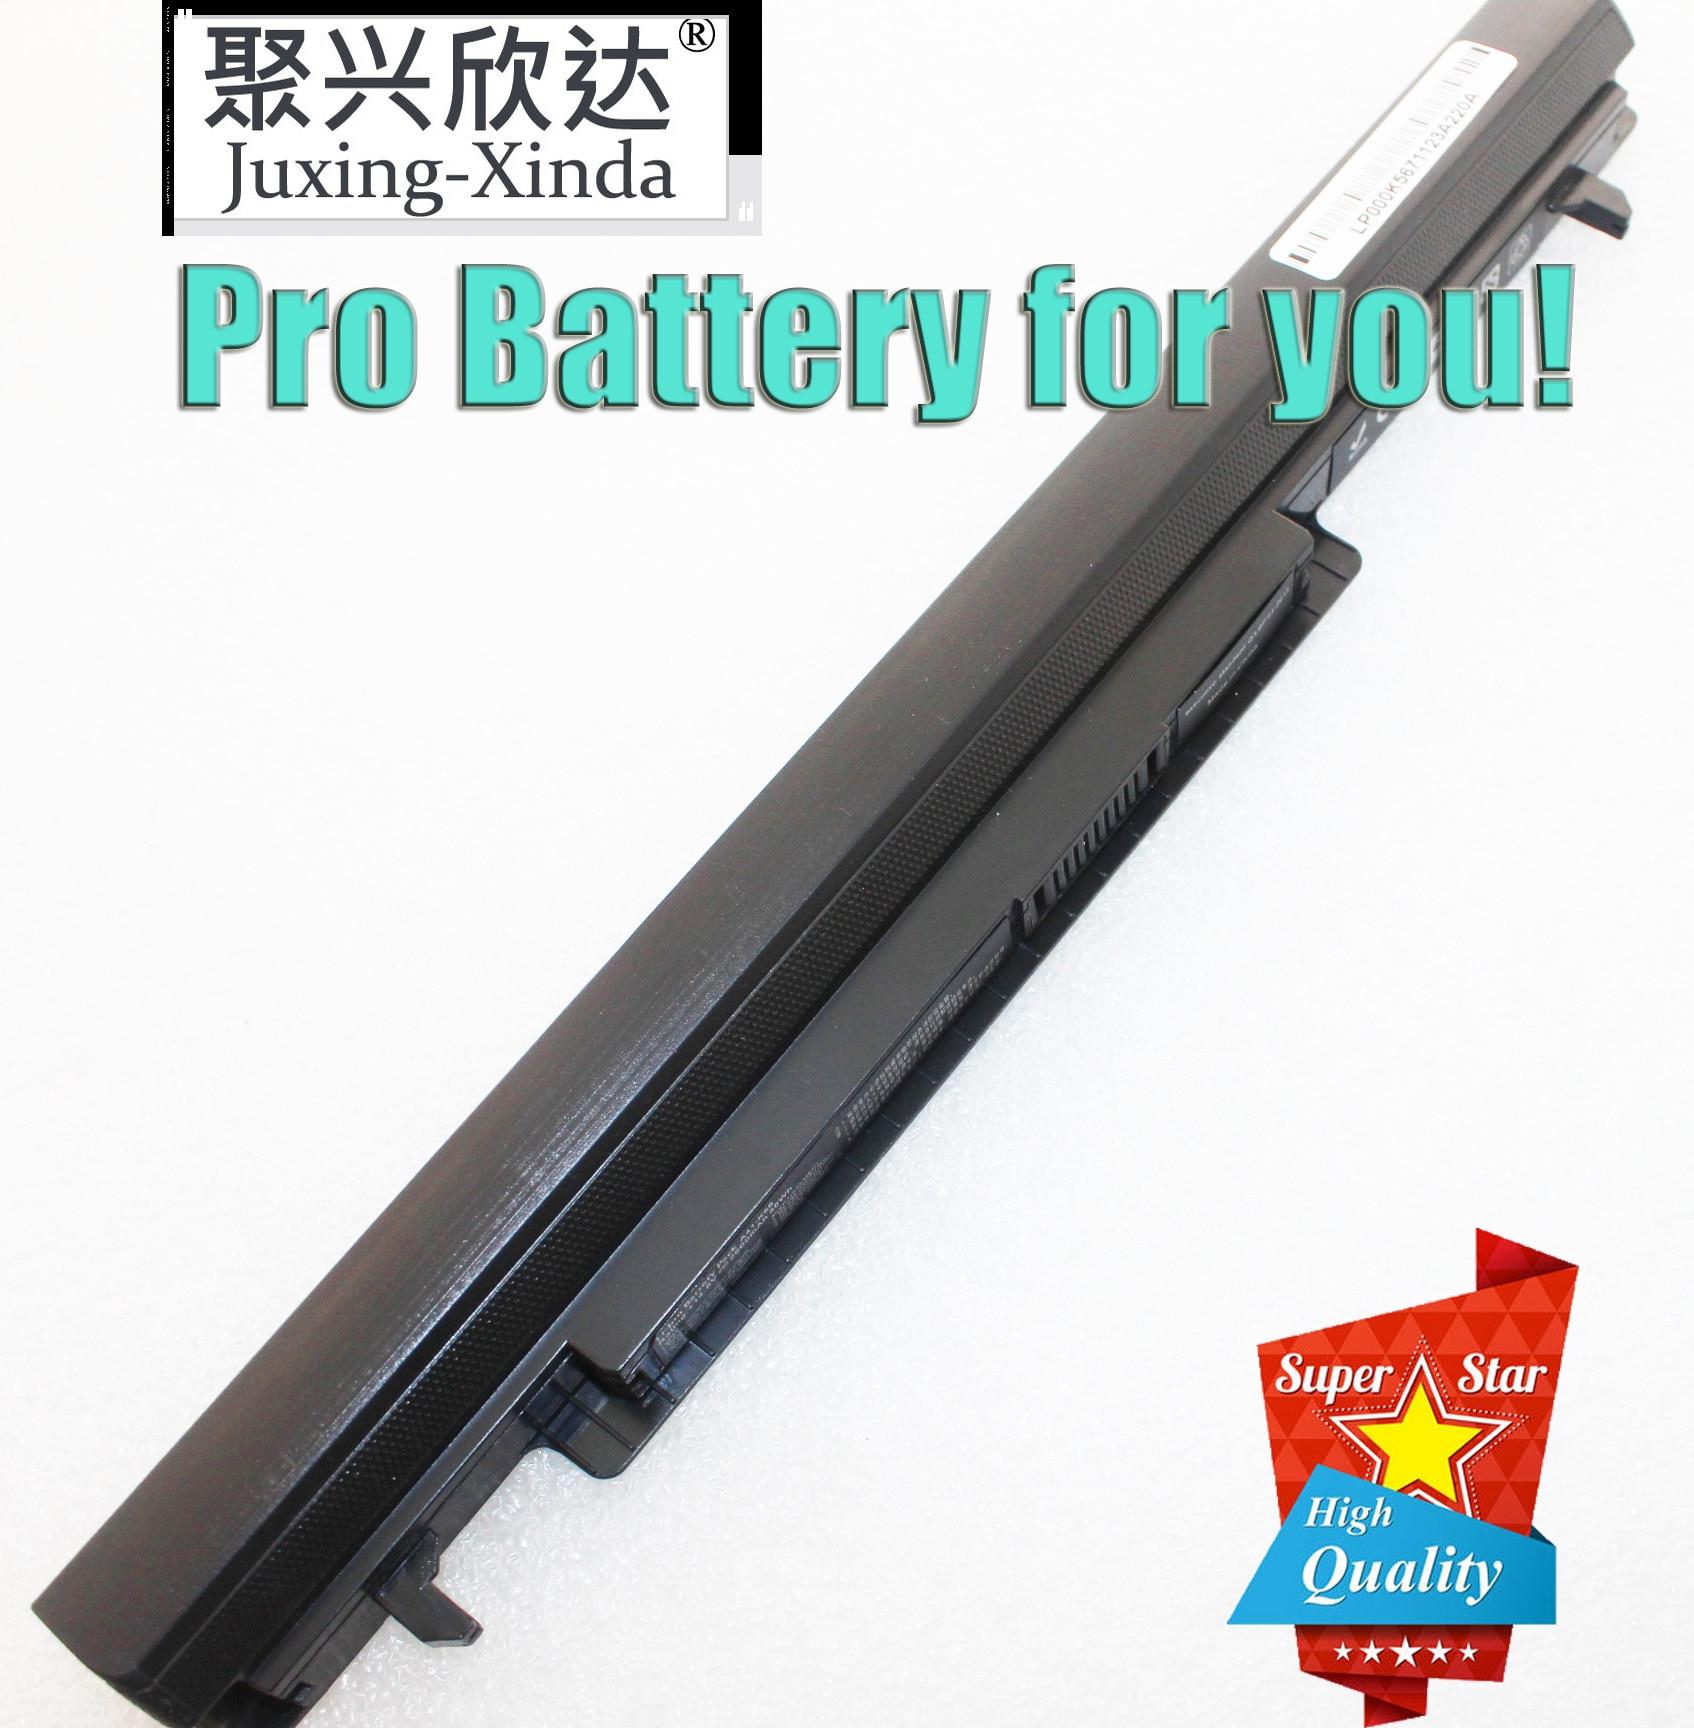 k56cb motherboard for asus k56cb k56cm a56c s550cm s56c s550c s550cb k56 k56cm rev2 0 mainboard i5 3317u gt740 2g n14p ge op a2 Laptop Battery For Asus A31-K56 A32-K56 A41-K56 A42-K56 Series A56 A46 K56 K56C K56CA K56CM K46 K46C K46CA K46CM S56 S46 R505